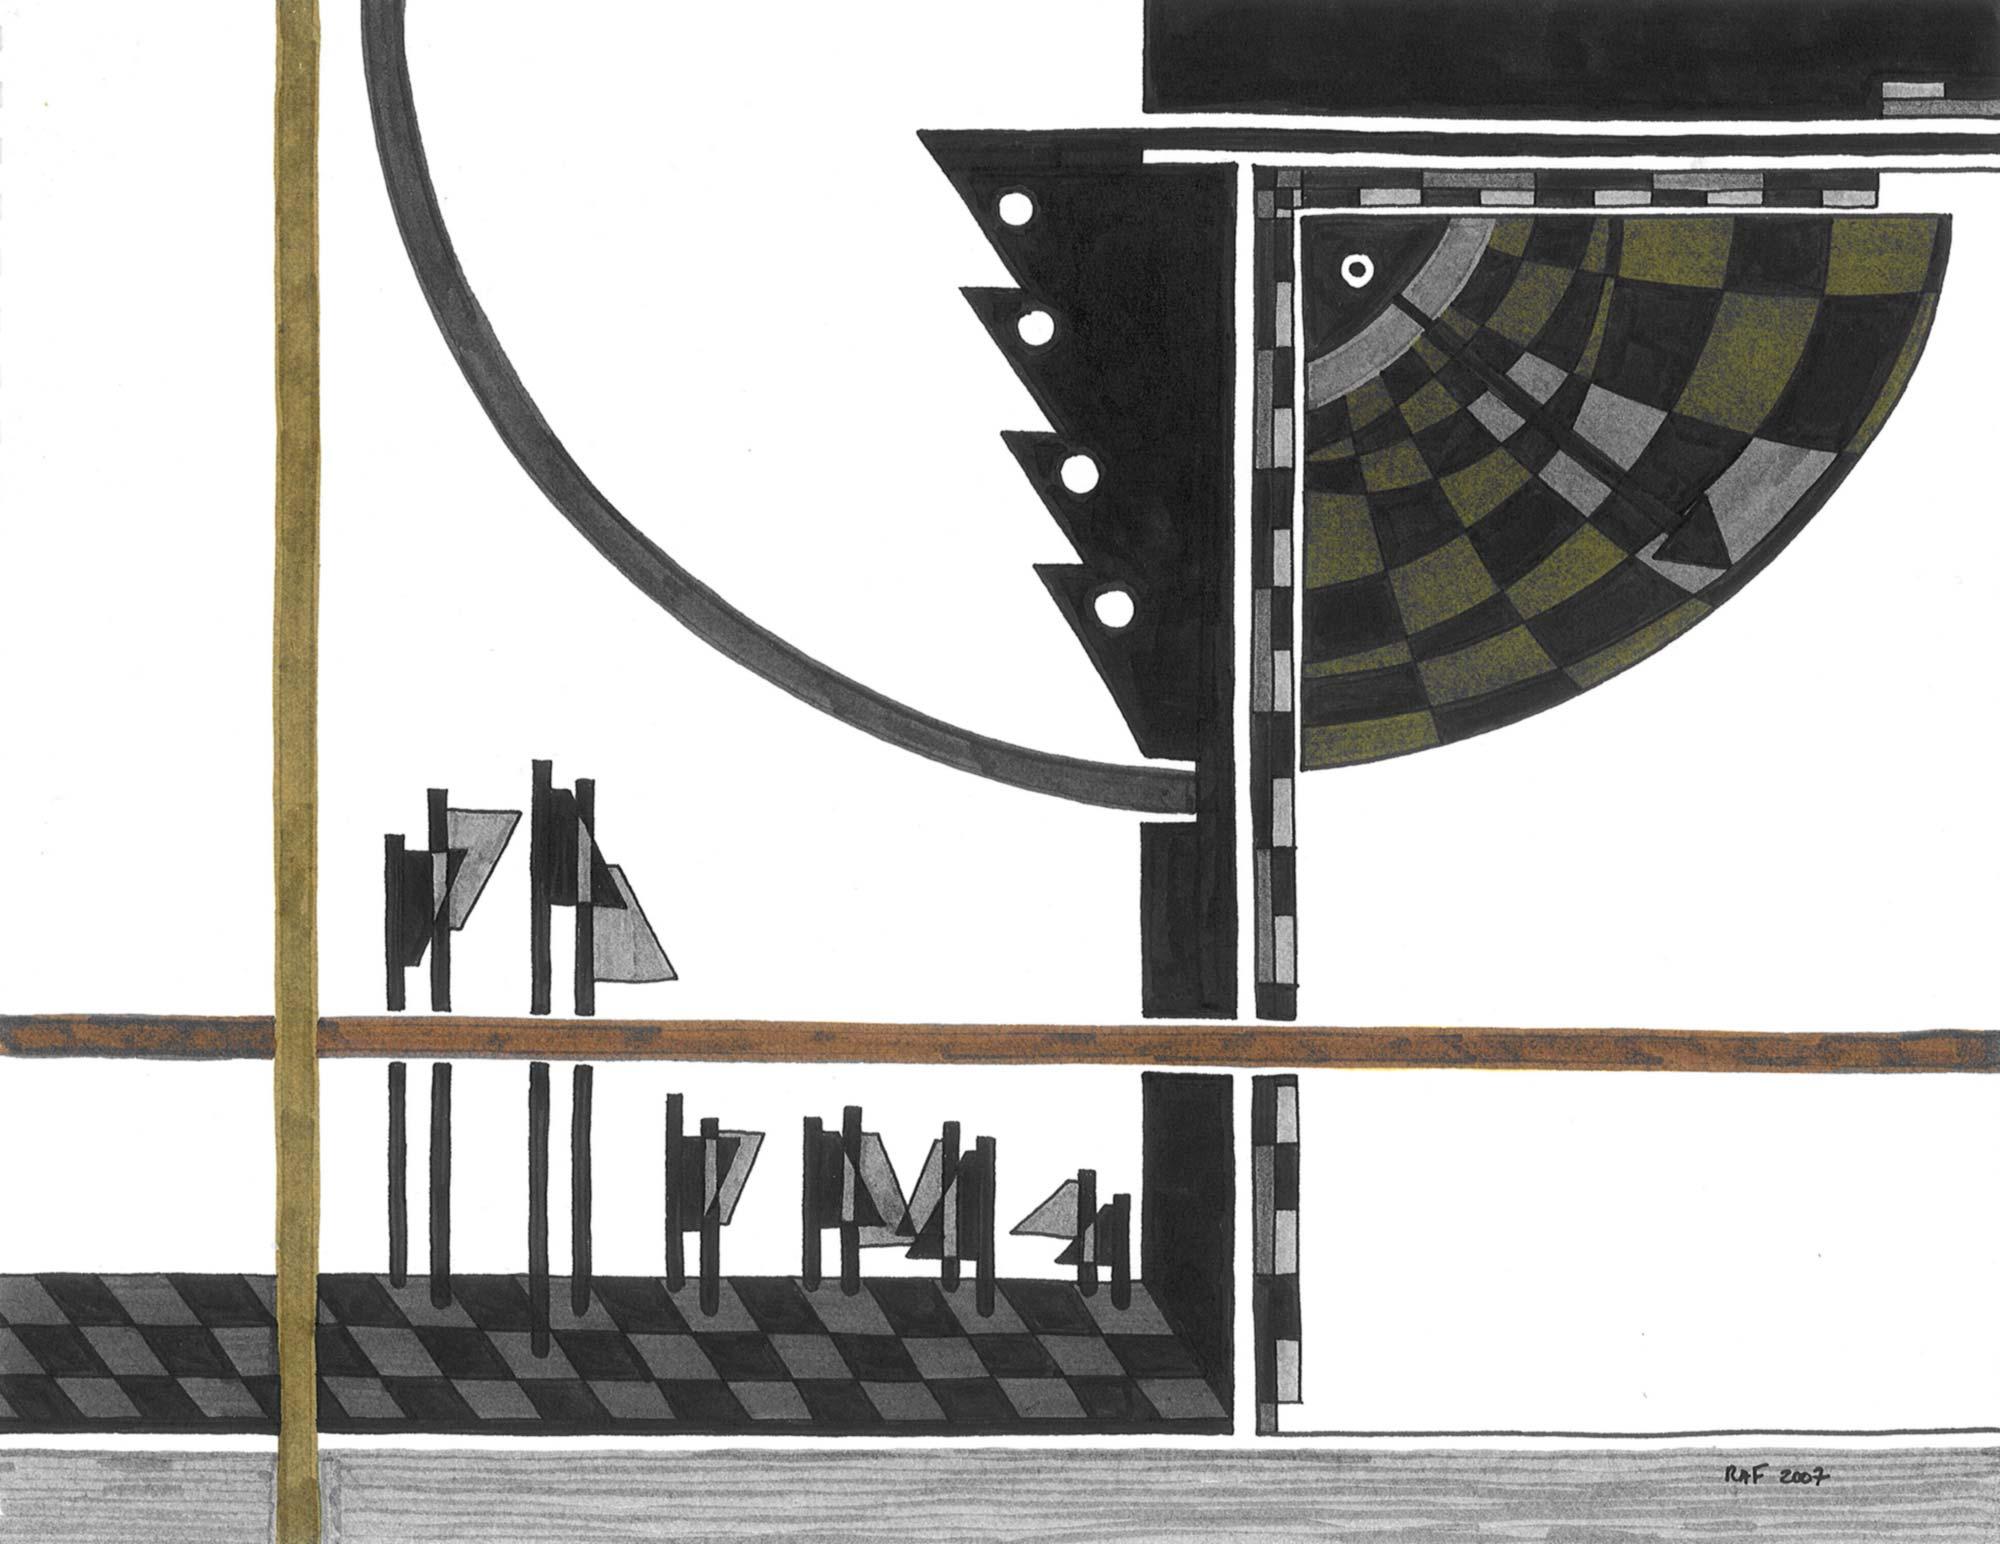 Manoeuvres, dessin, Raf Listowski, 2007